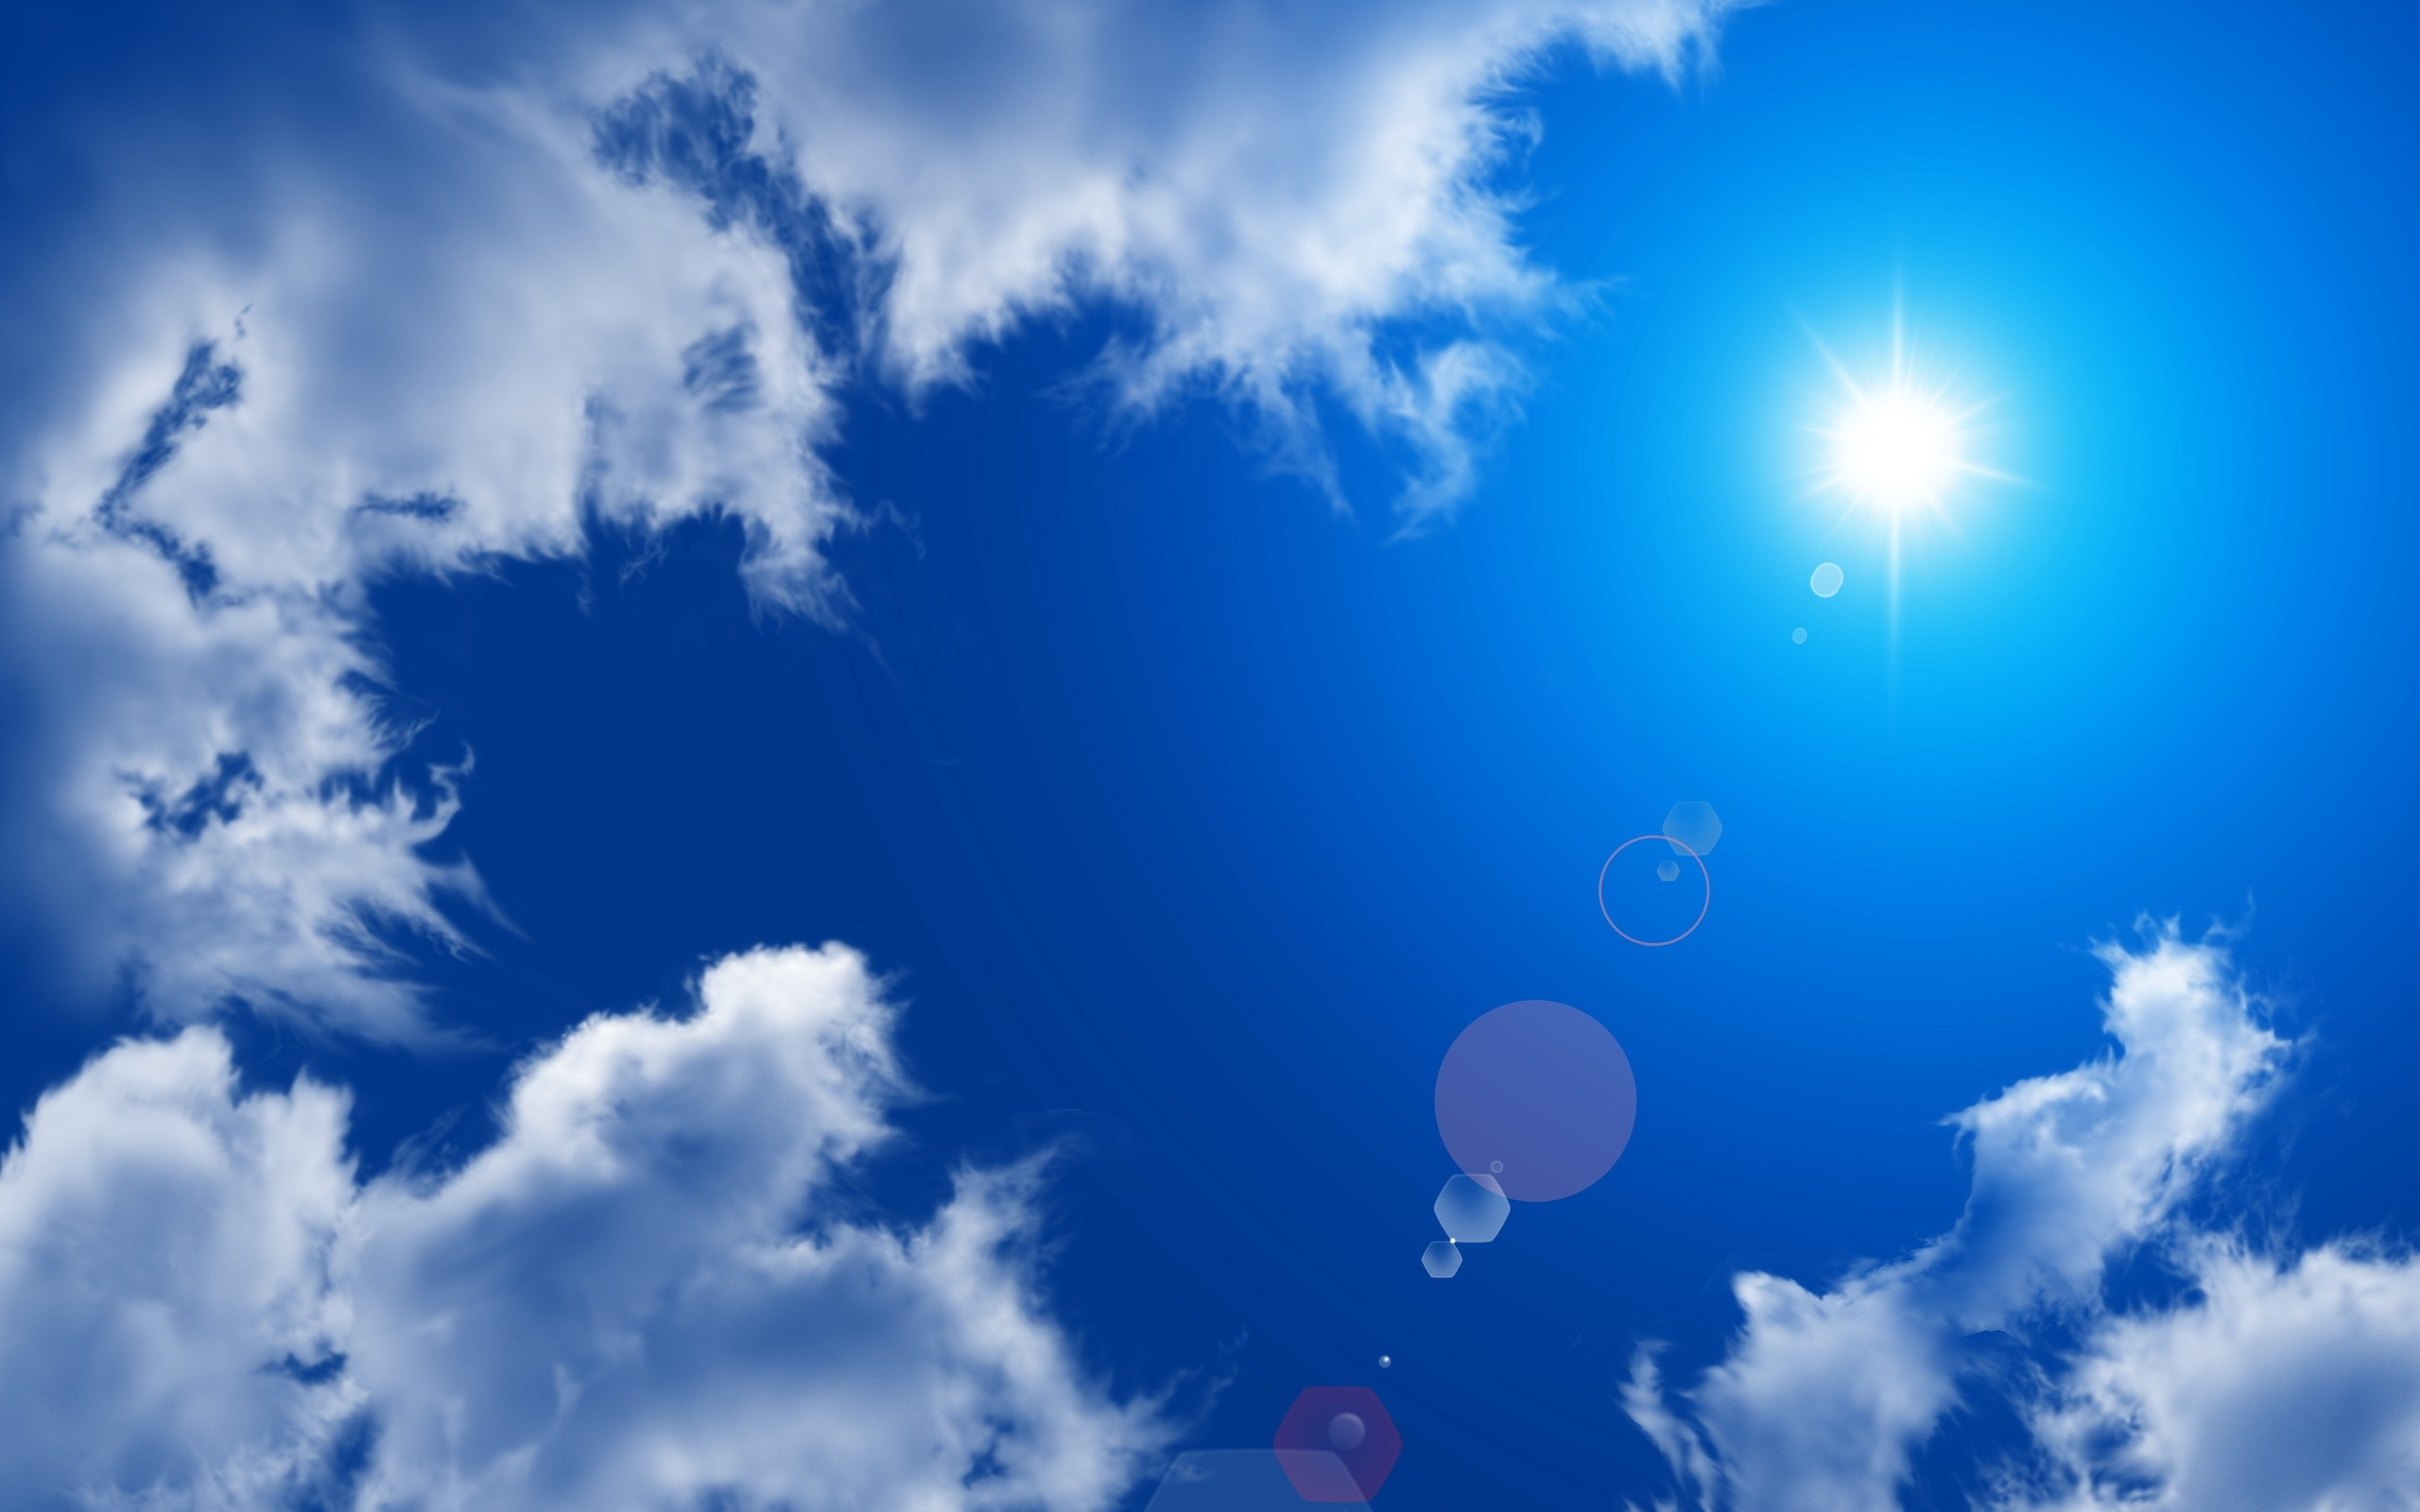 Sunshine Blue Sky Wallpaper 2560x1600 34686